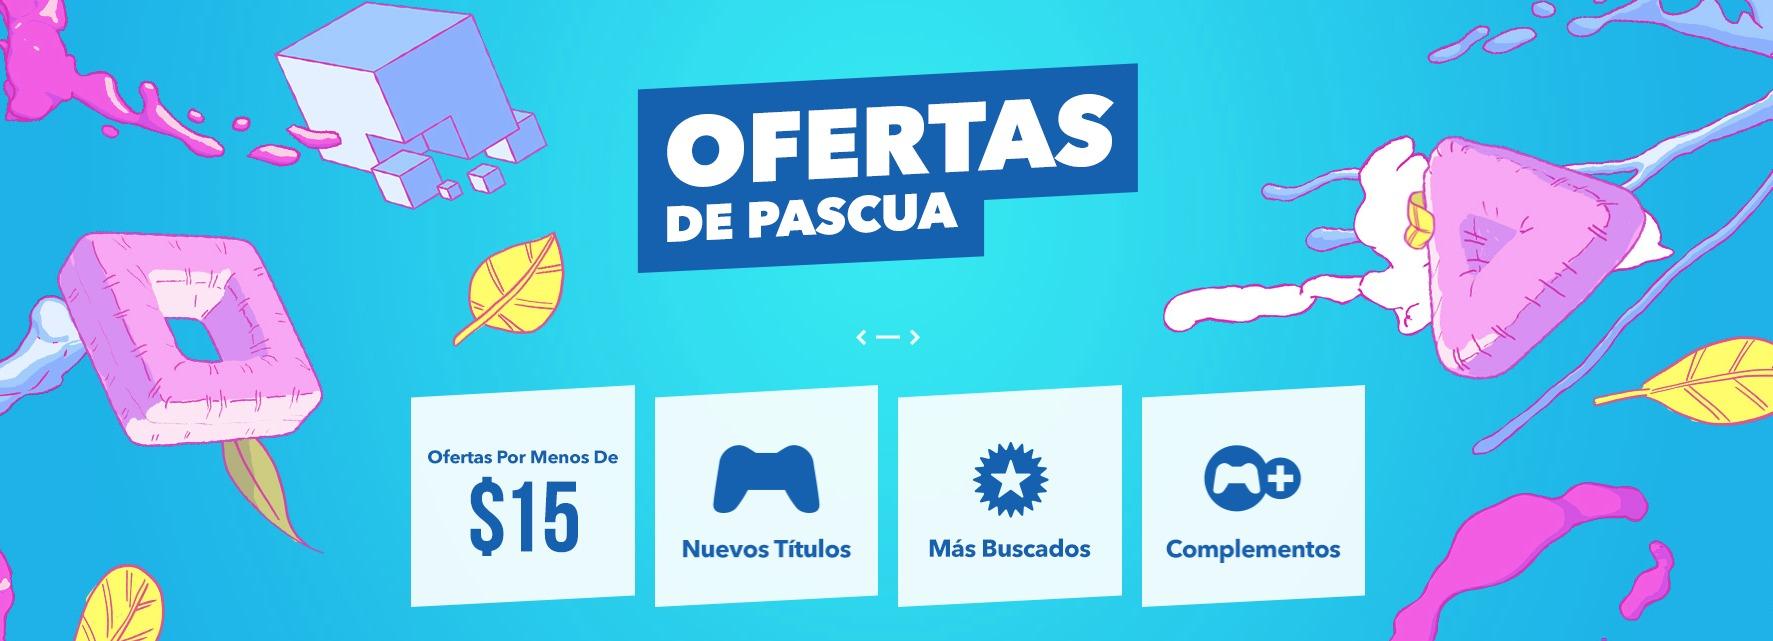 PlayStation 4 ofertas